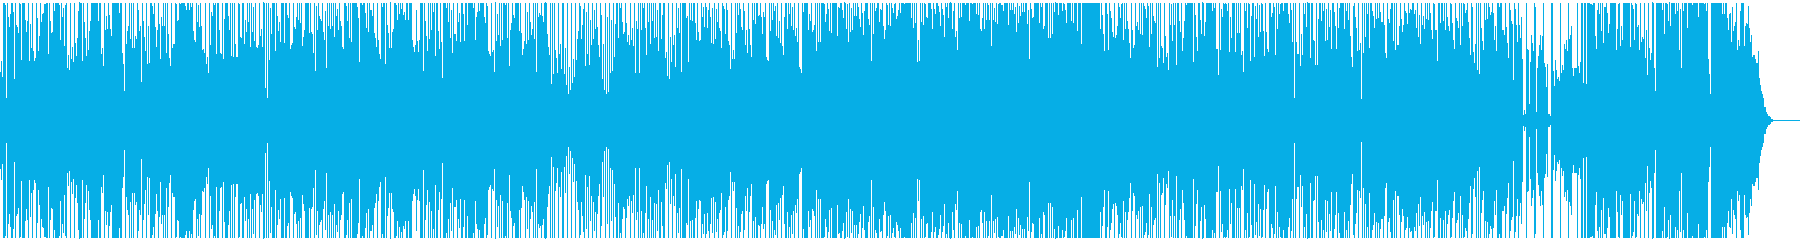 EGの効いた爽やかなオルガン・インストの再生済みの波形